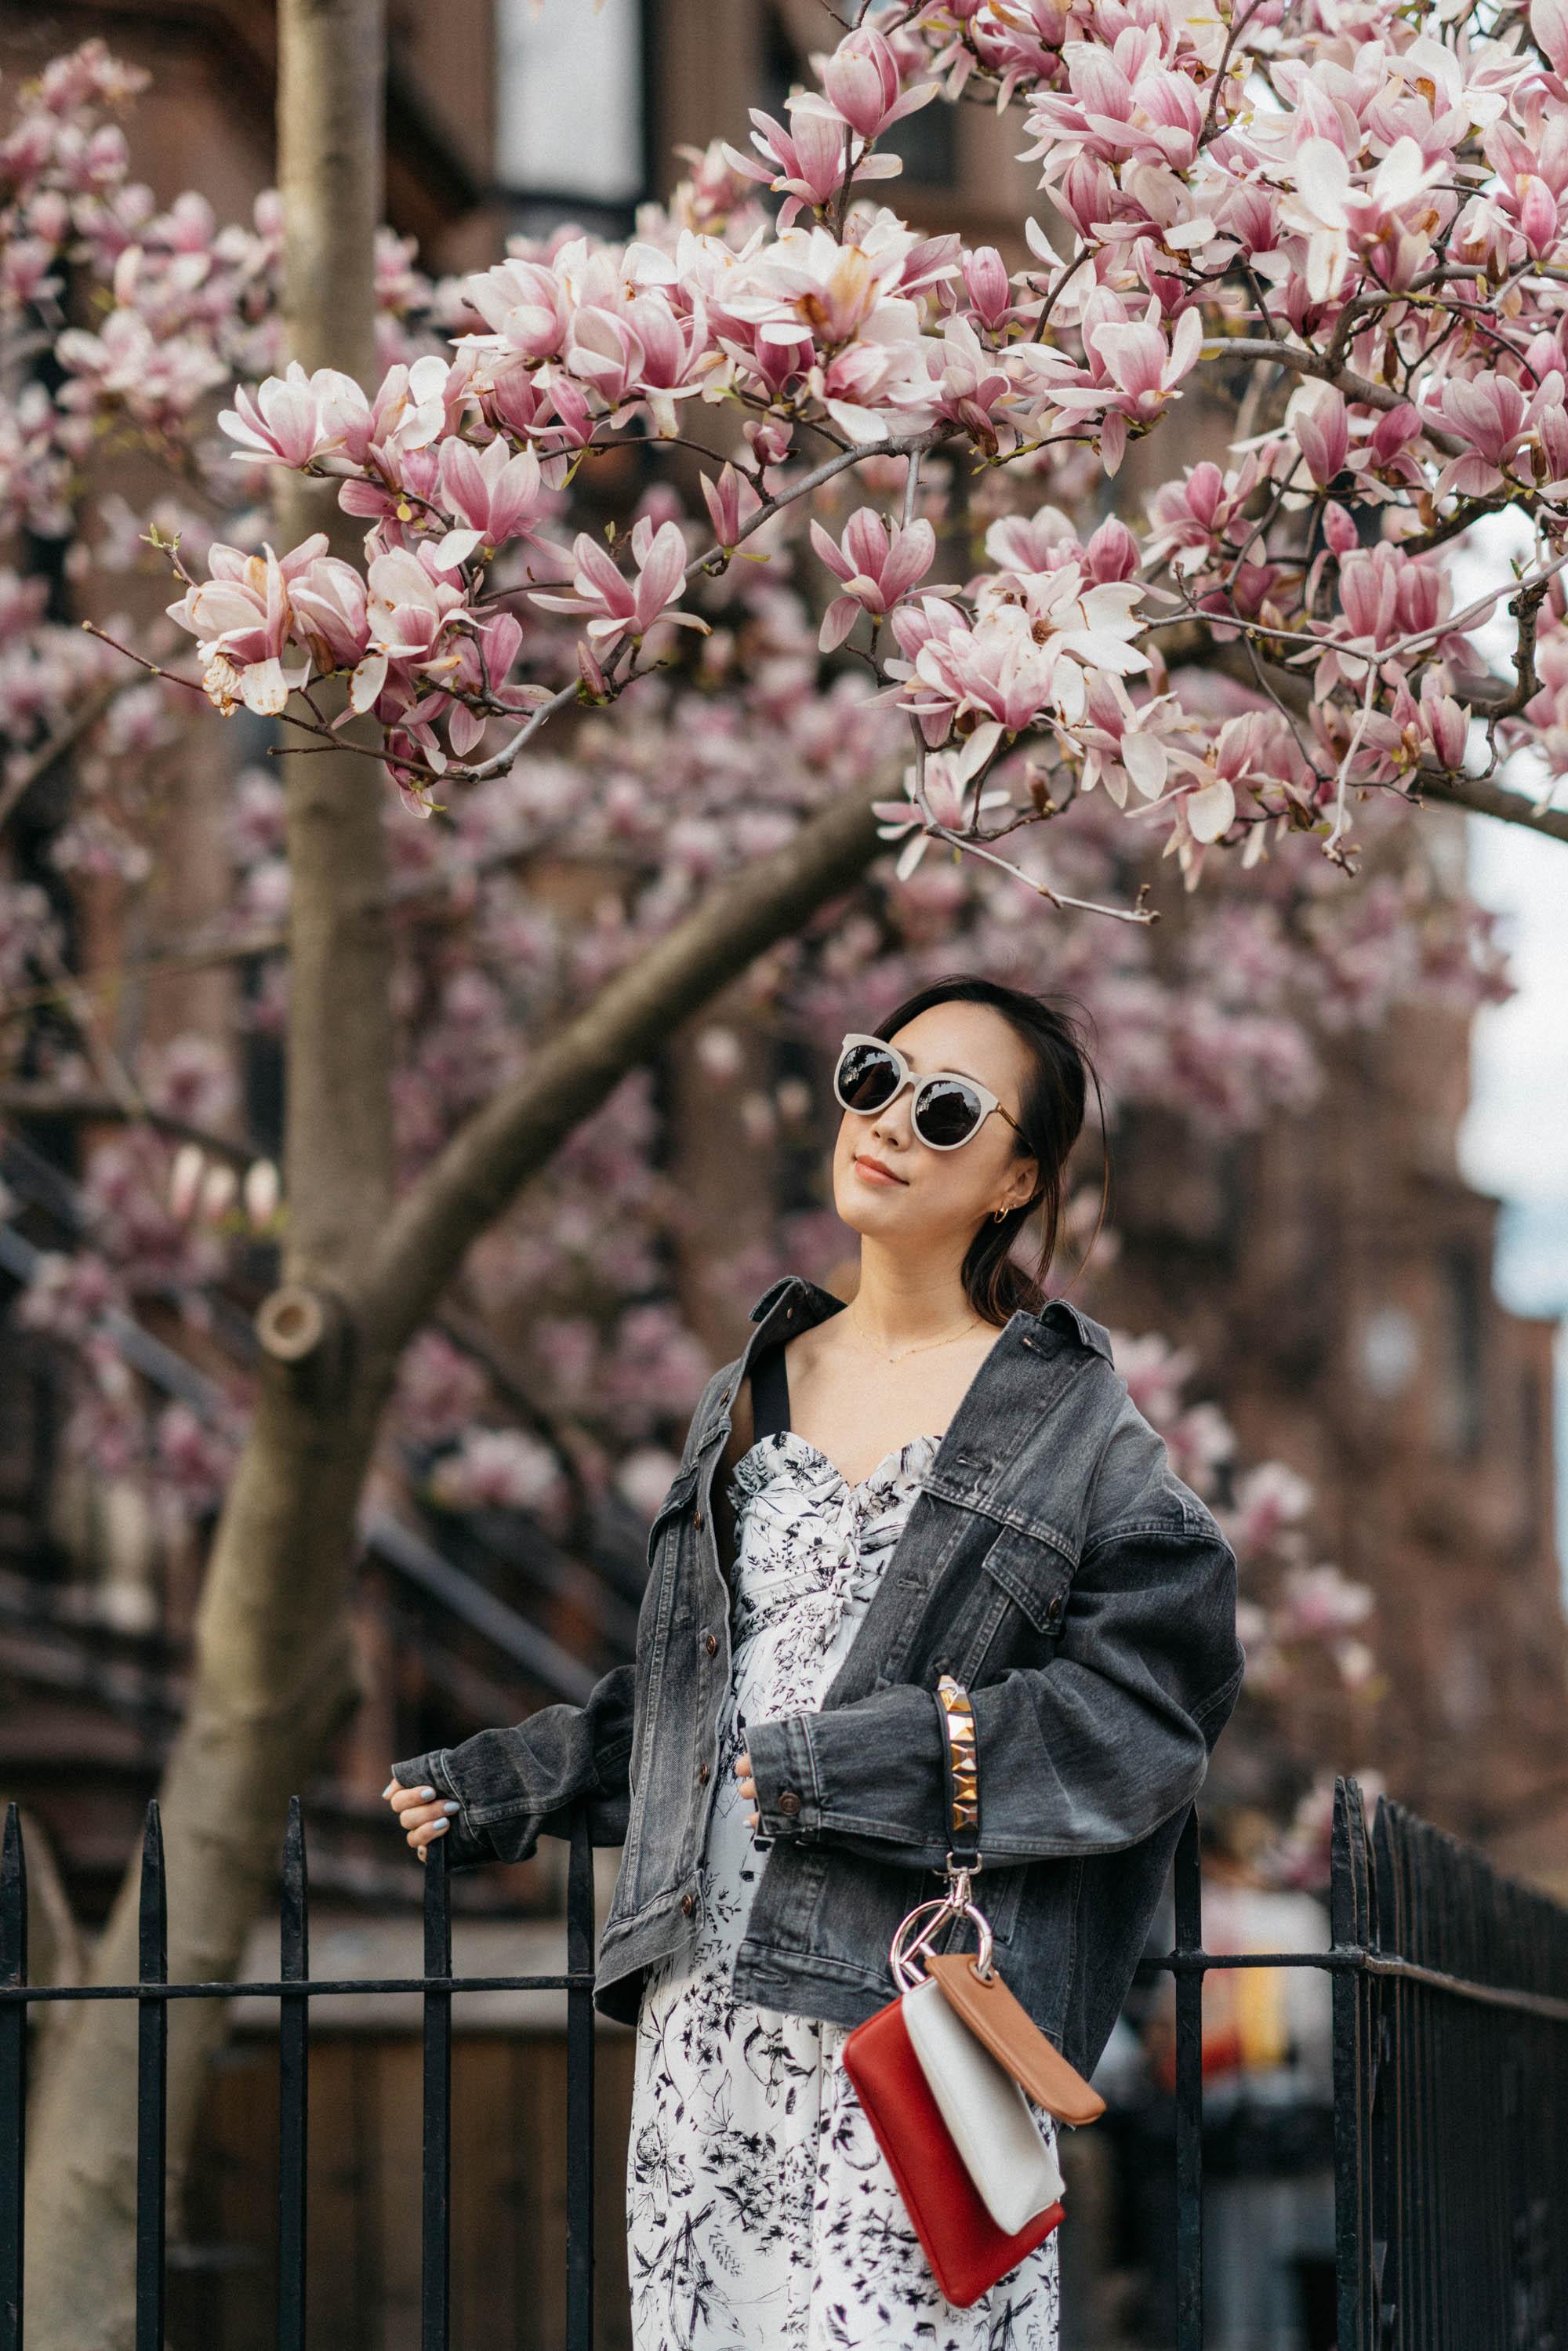 Balenciaga Jacket, Noon by Noor Dress, Fendi Bag, Gentle Monster Sunglasses